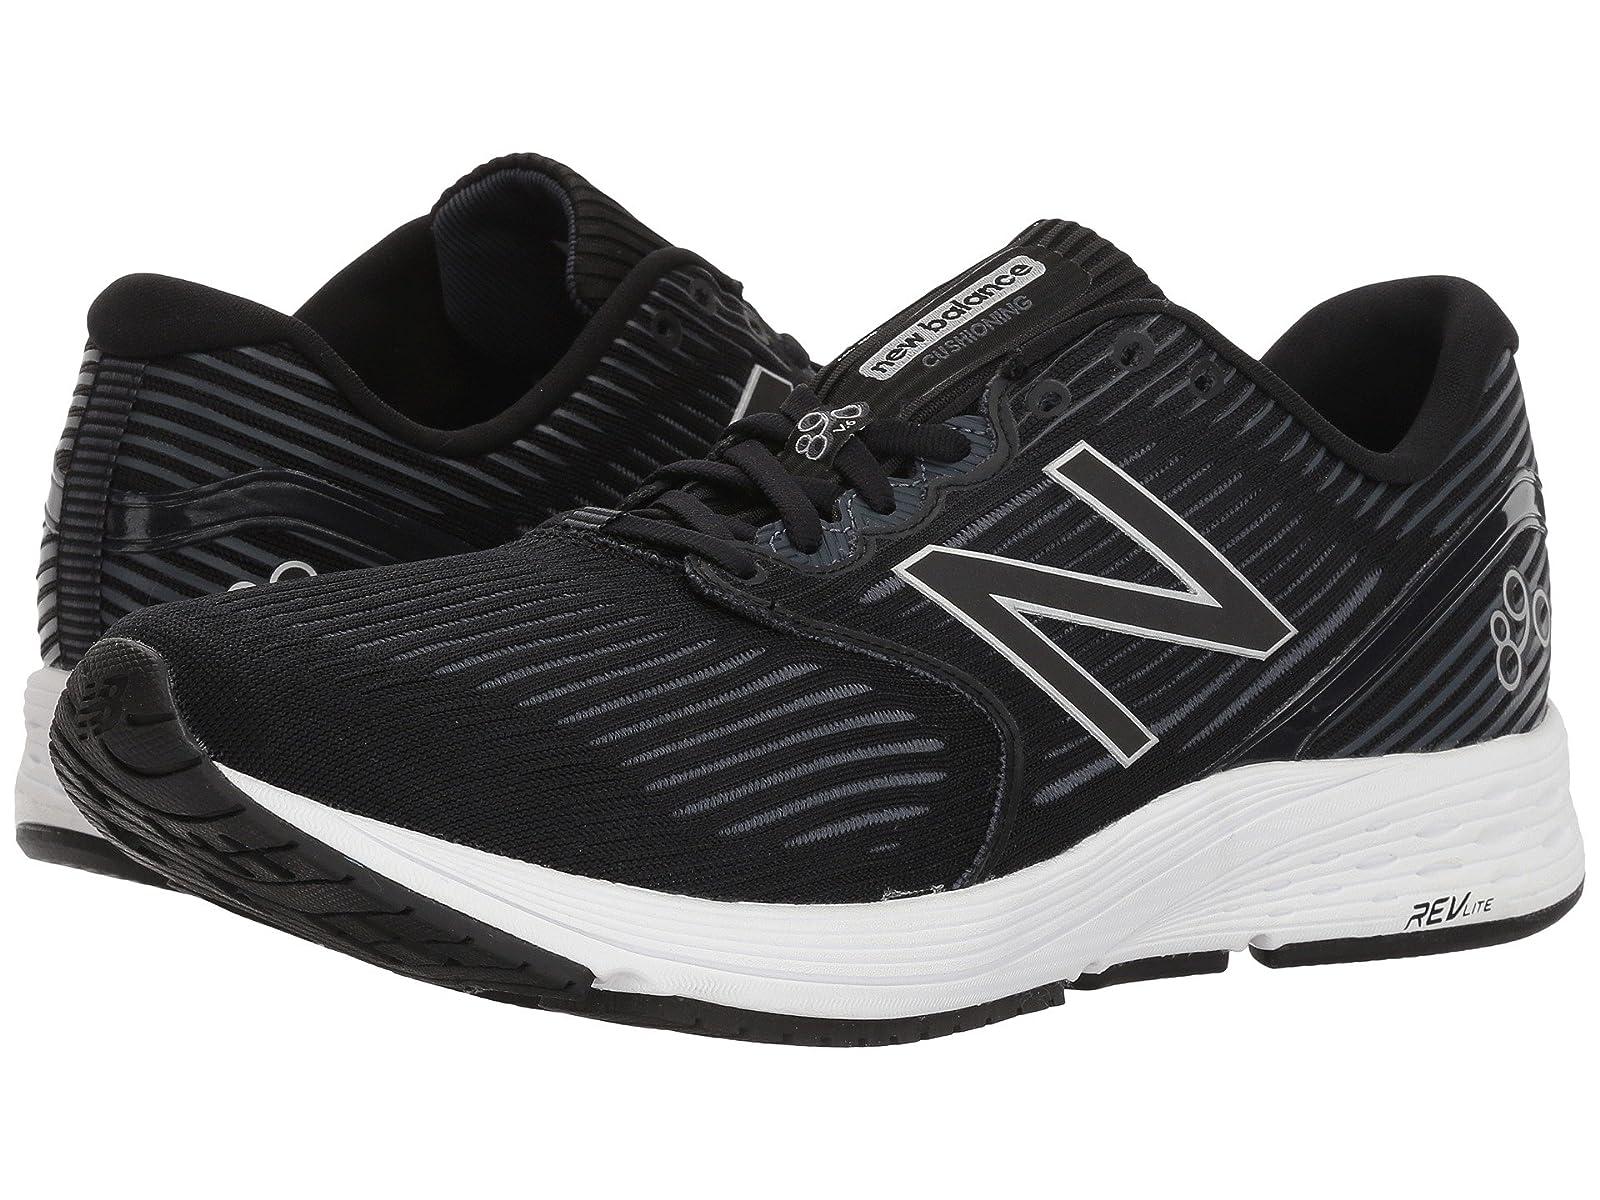 New Balance 890v6Atmospheric grades have affordable shoes